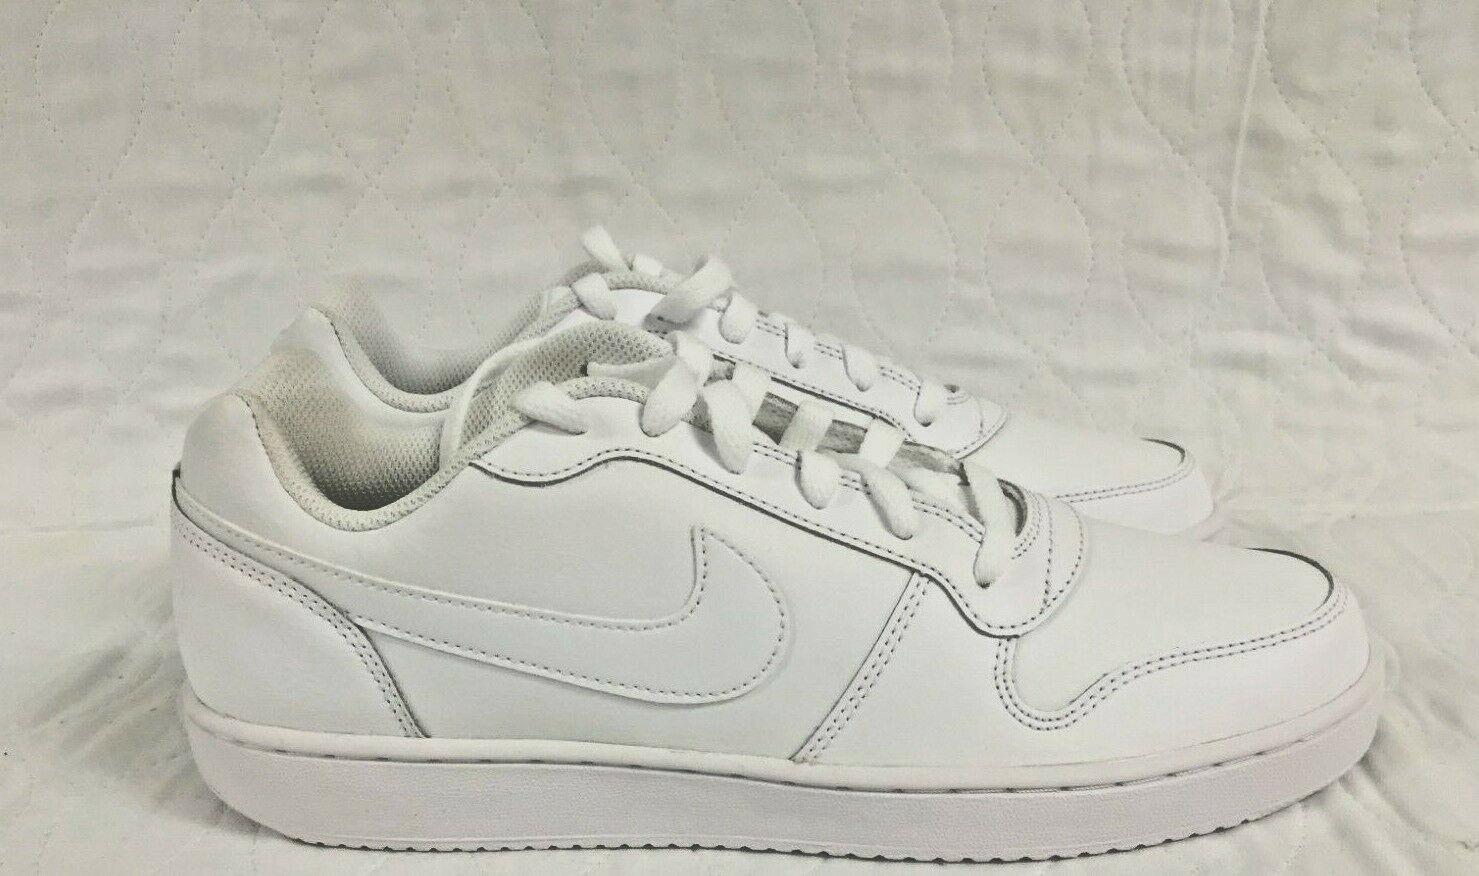 White Men's Draft Low Court Shoe Size